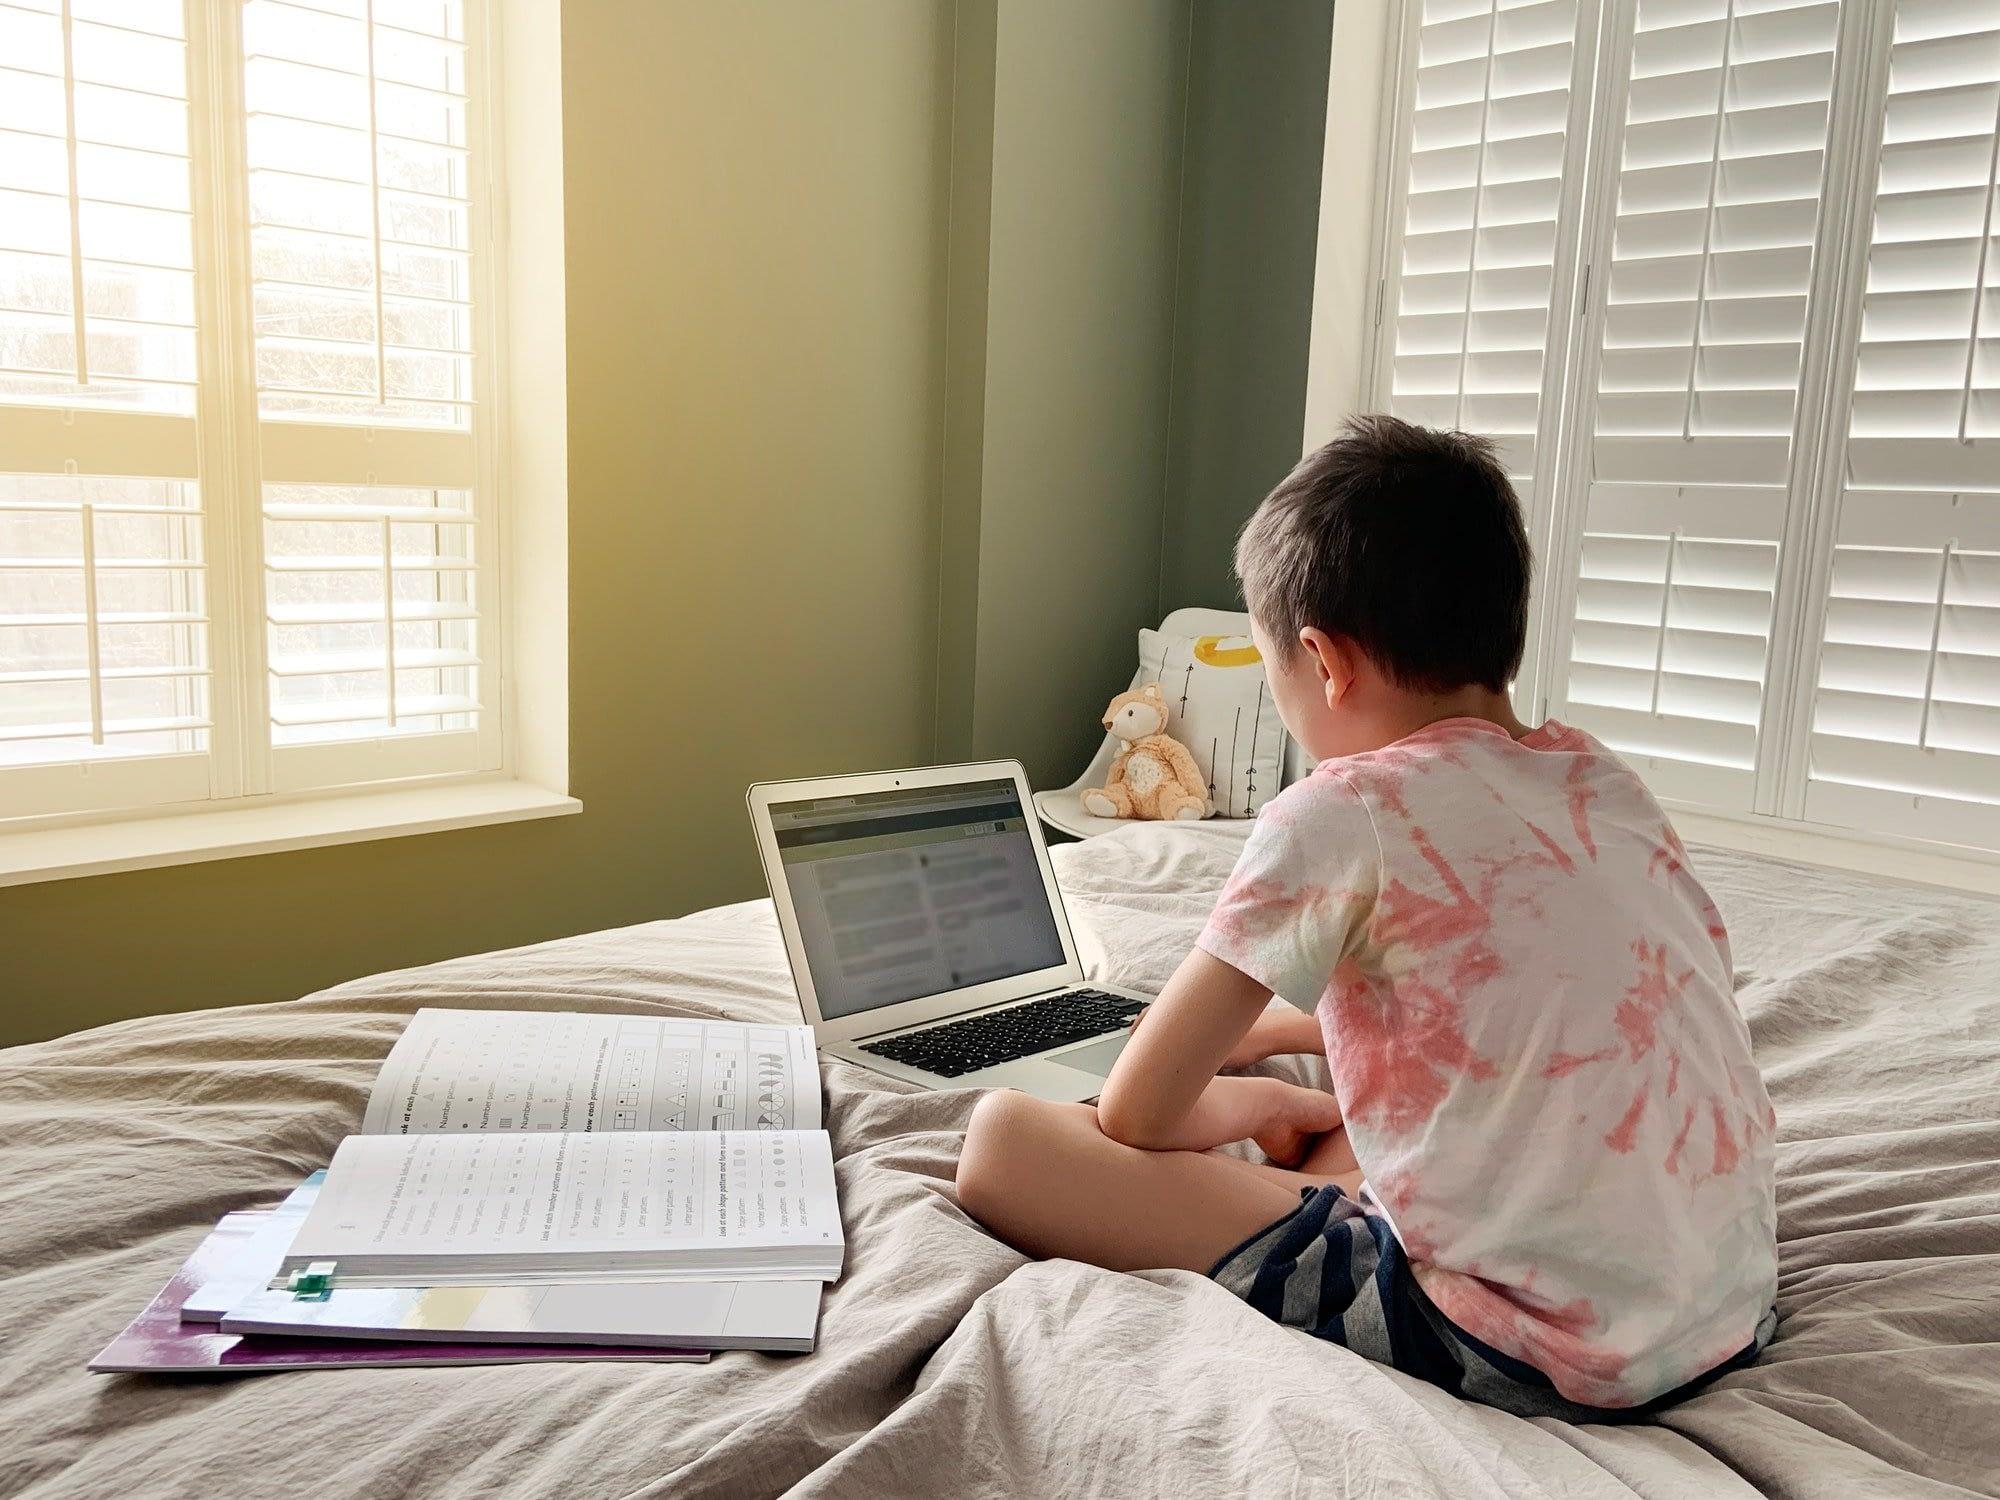 boy; child; education; class; home; learn; online; Internet; homeschooling; school; virtual; laptop;